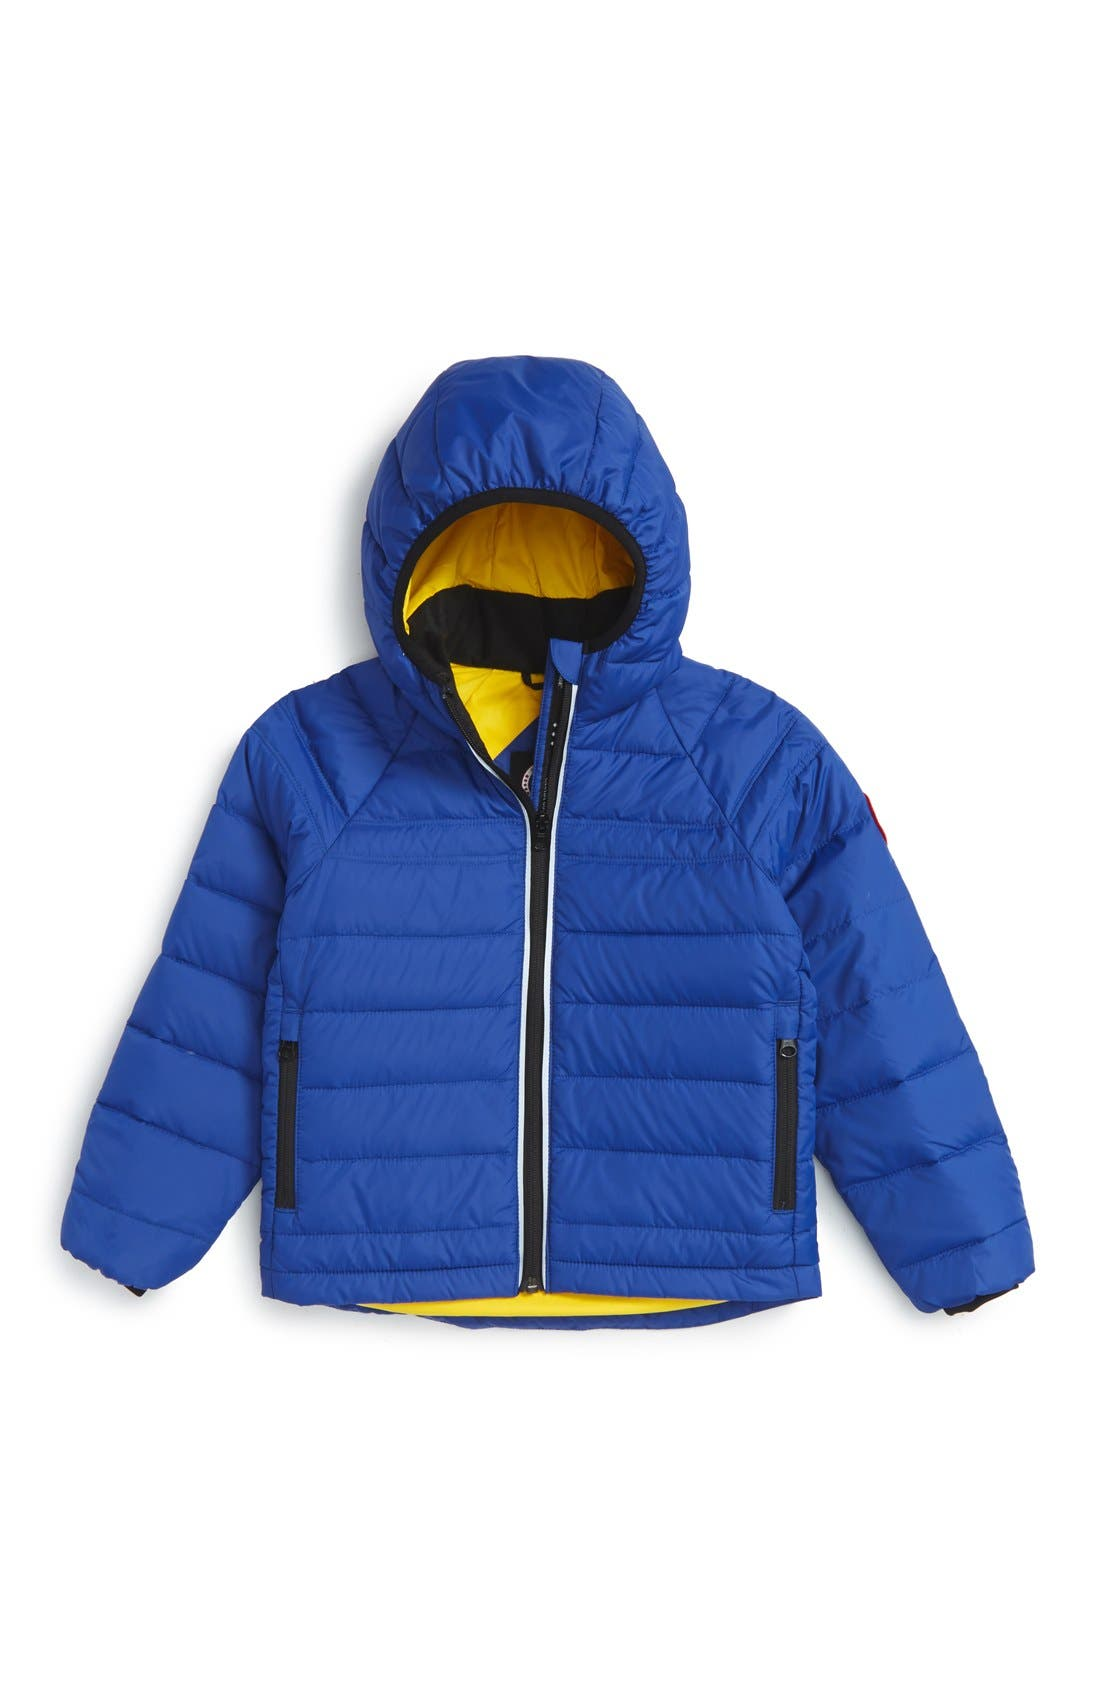 Alternate Image 1 Selected - Canada Goose 'Bobcat' Packable Down Coat (Toddler & Little Kid)